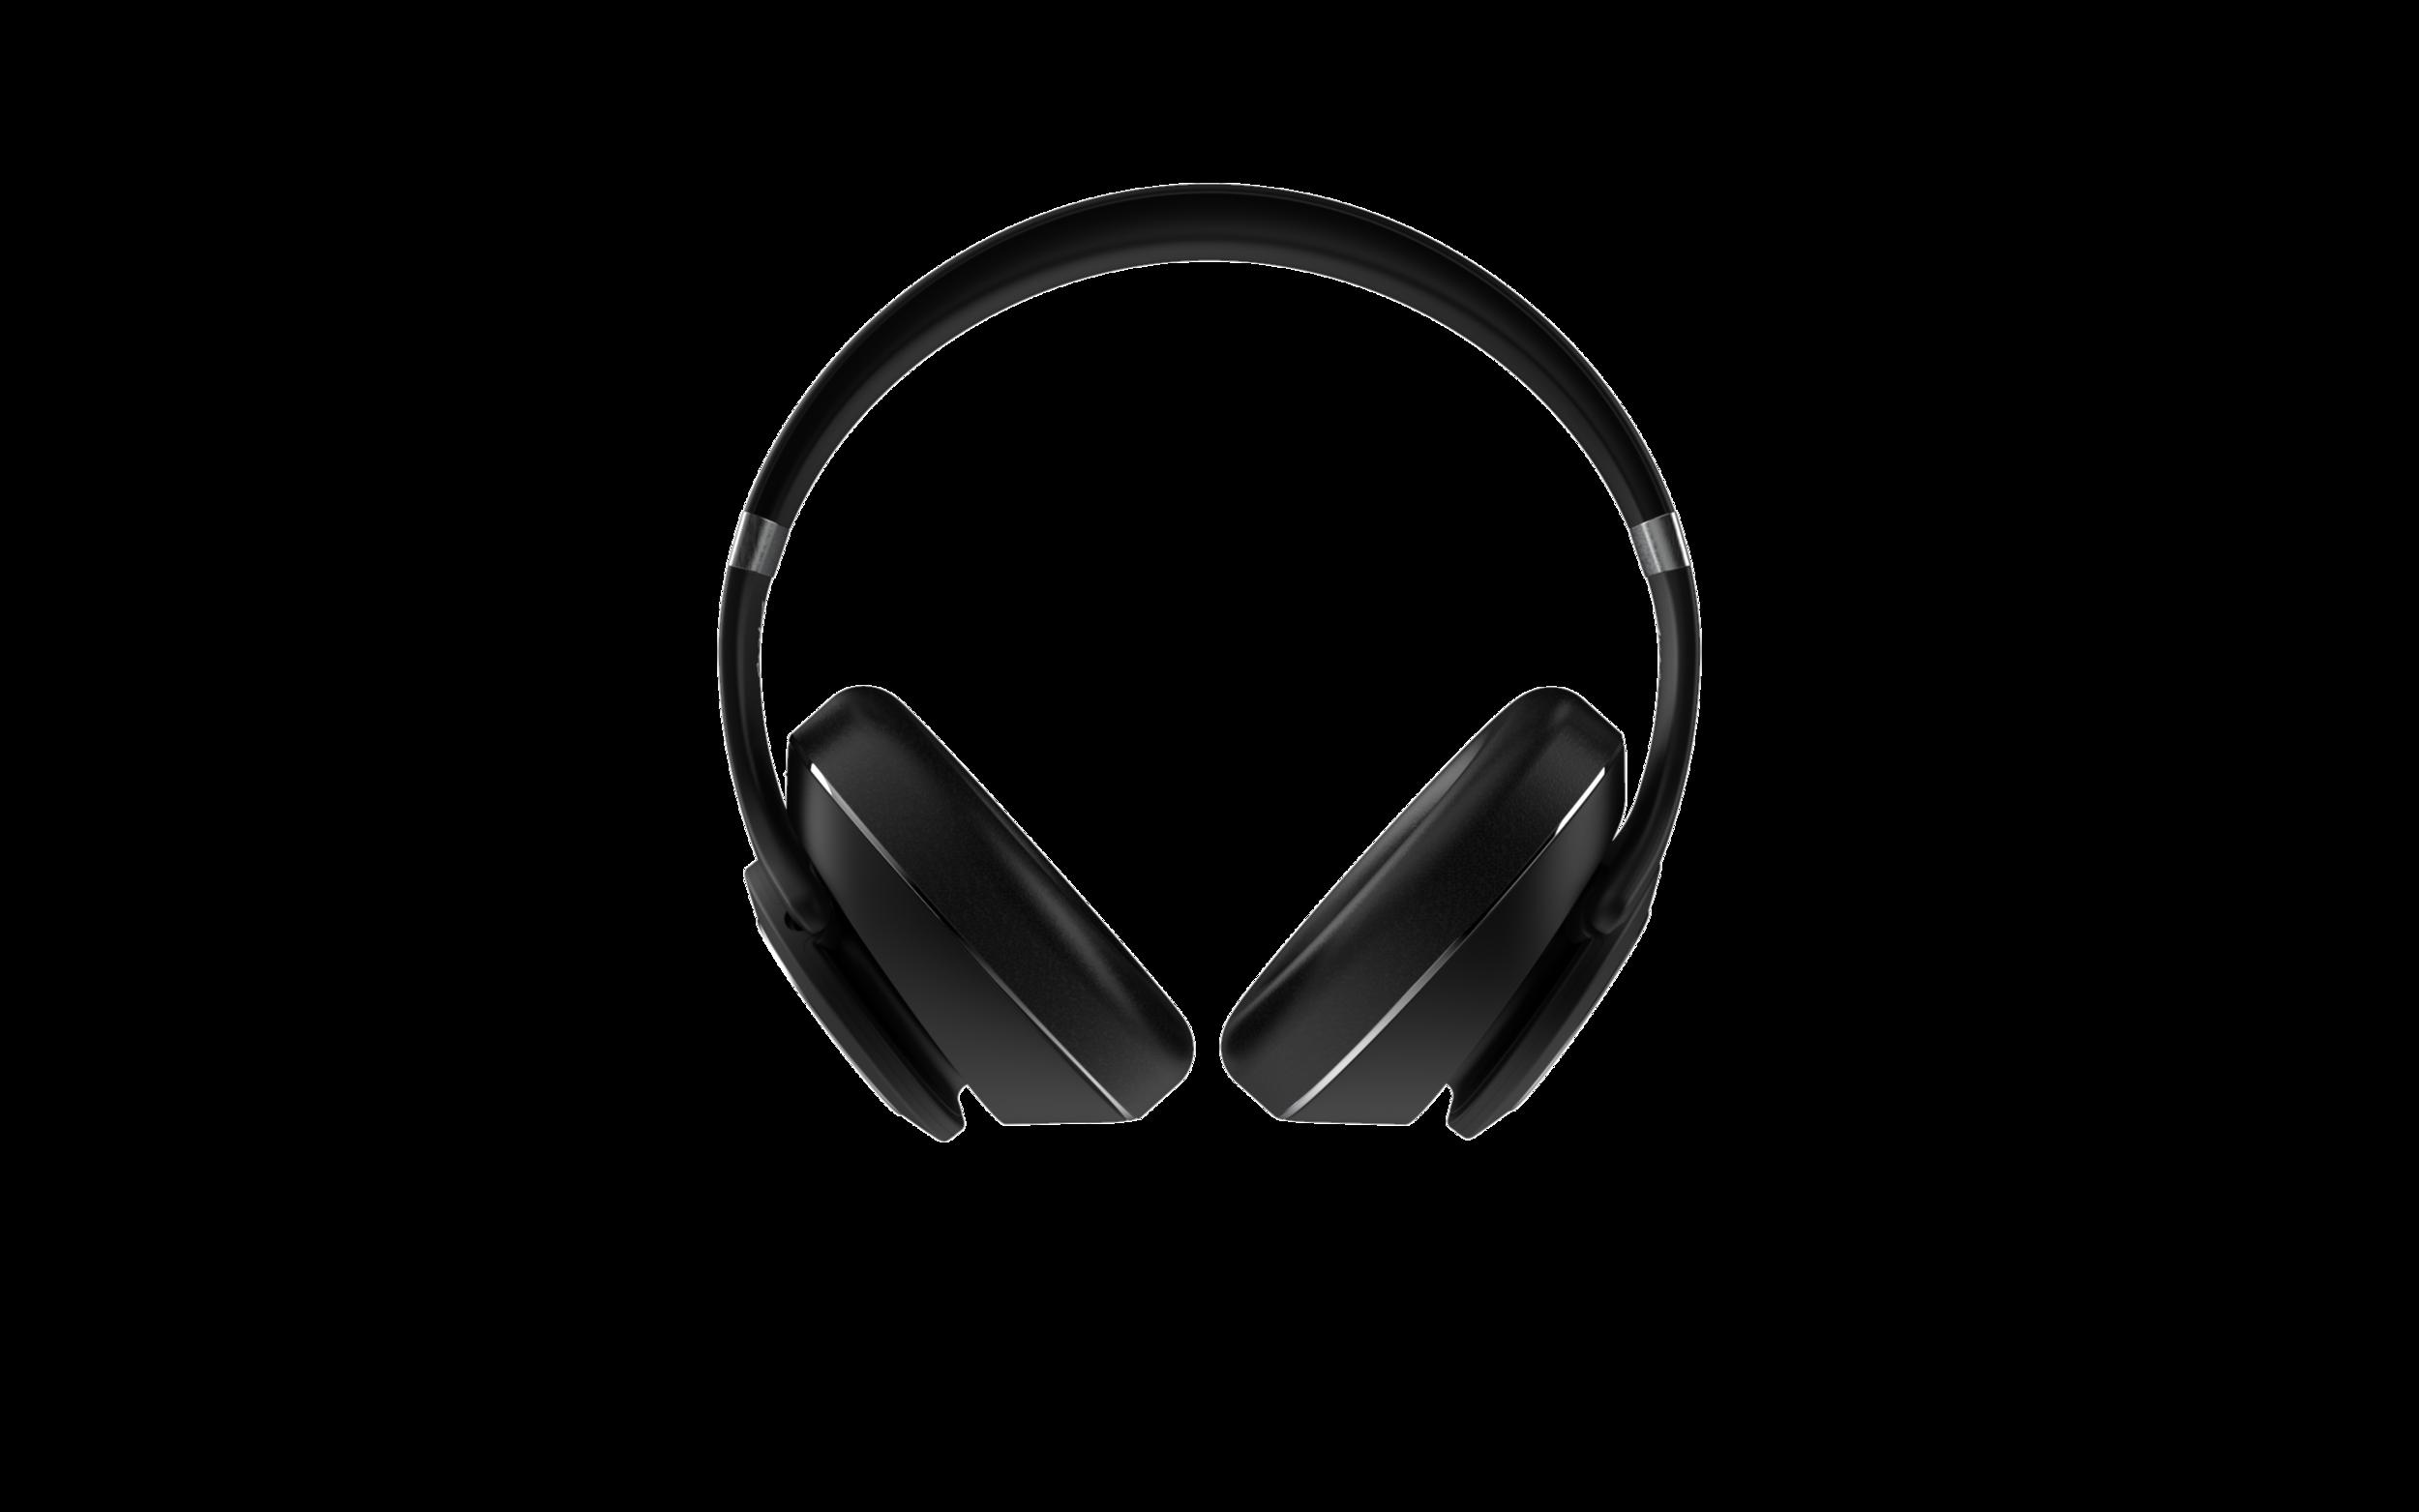 buoq-headphones-white10.png